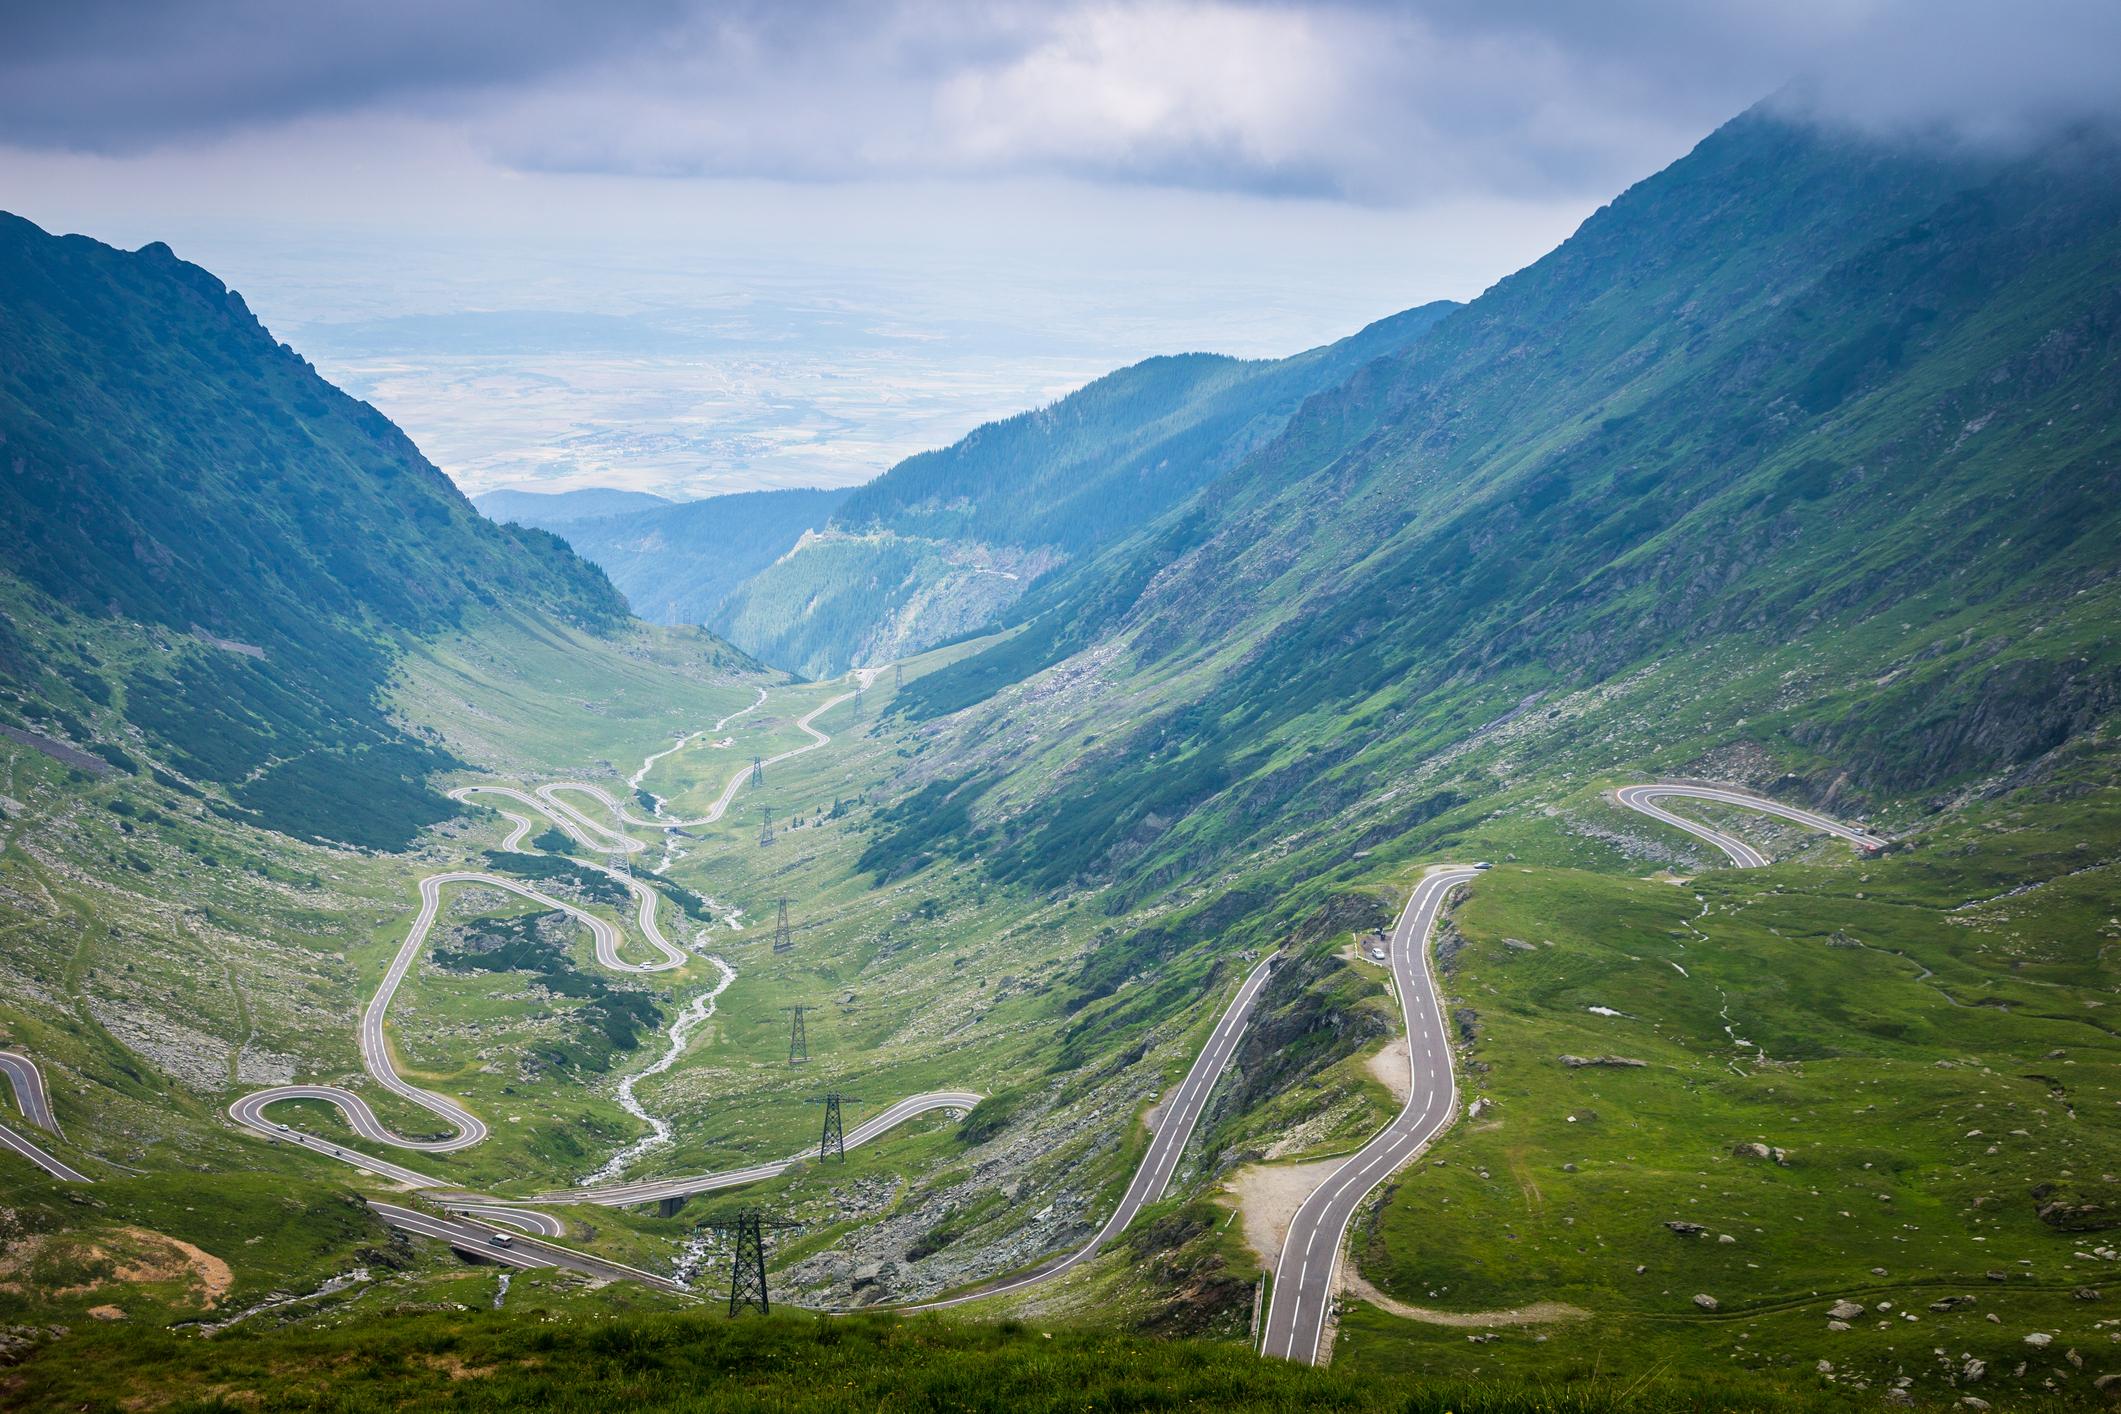 Carpathian Mountains in Transylvania